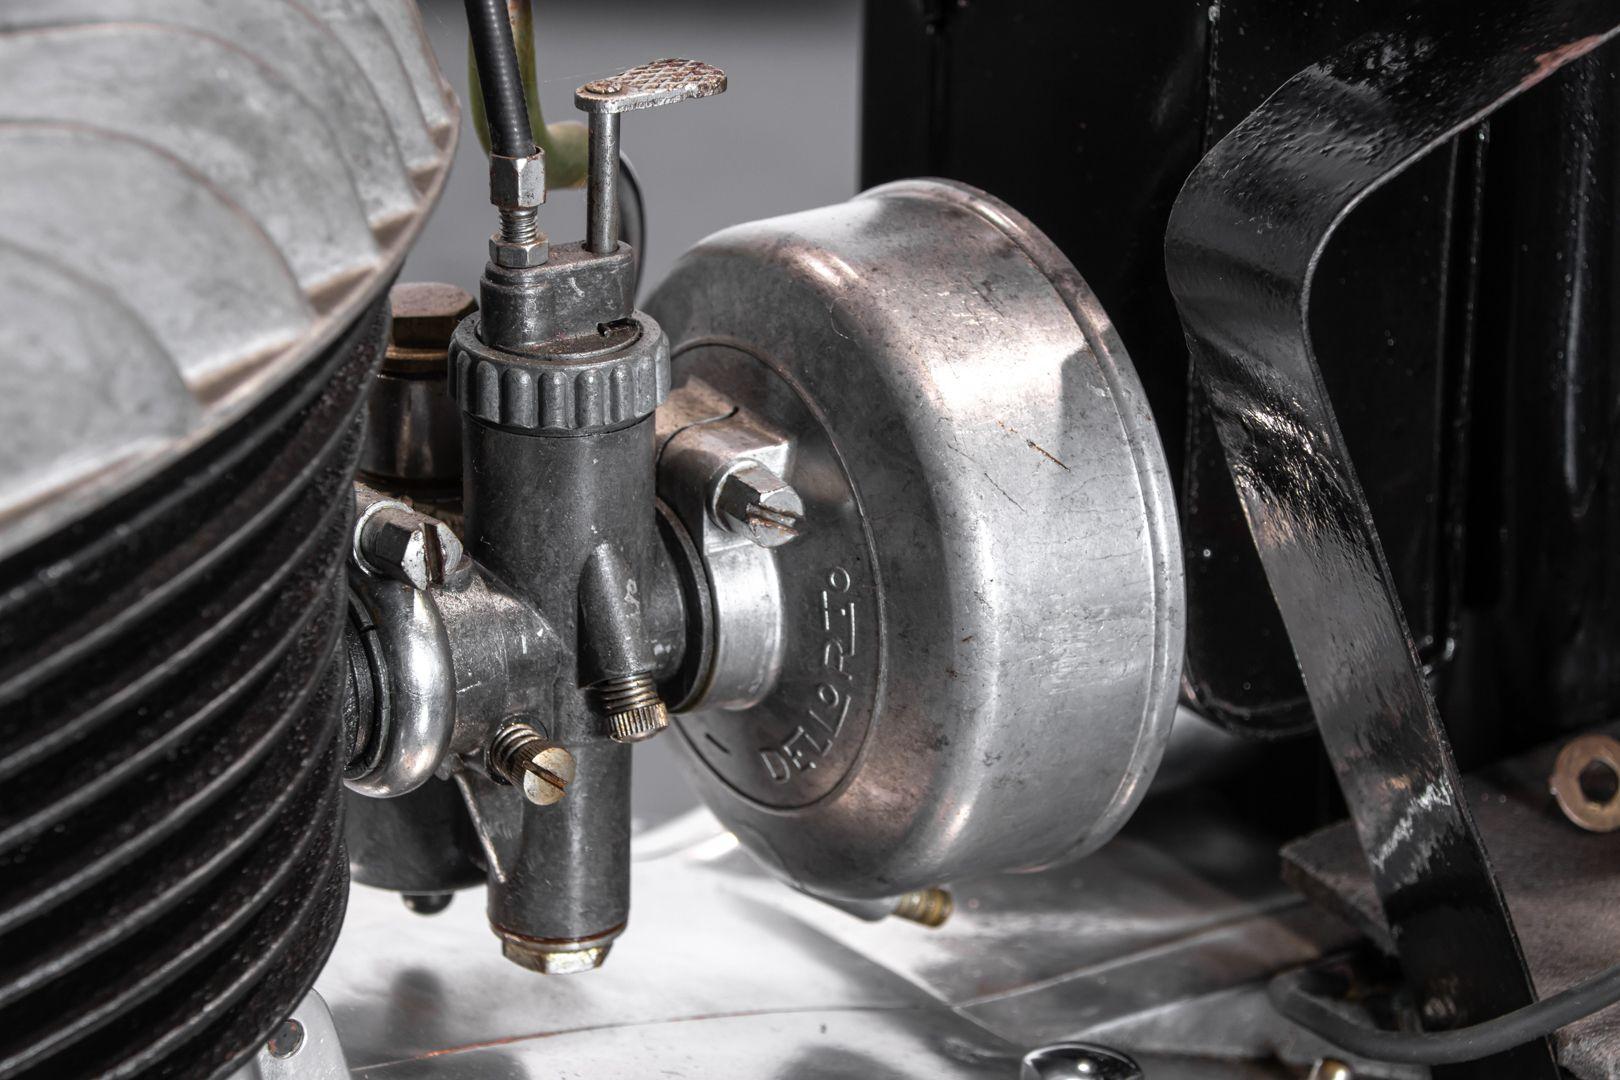 1952 Moto Morini Motore Lungo 2T 125 78782